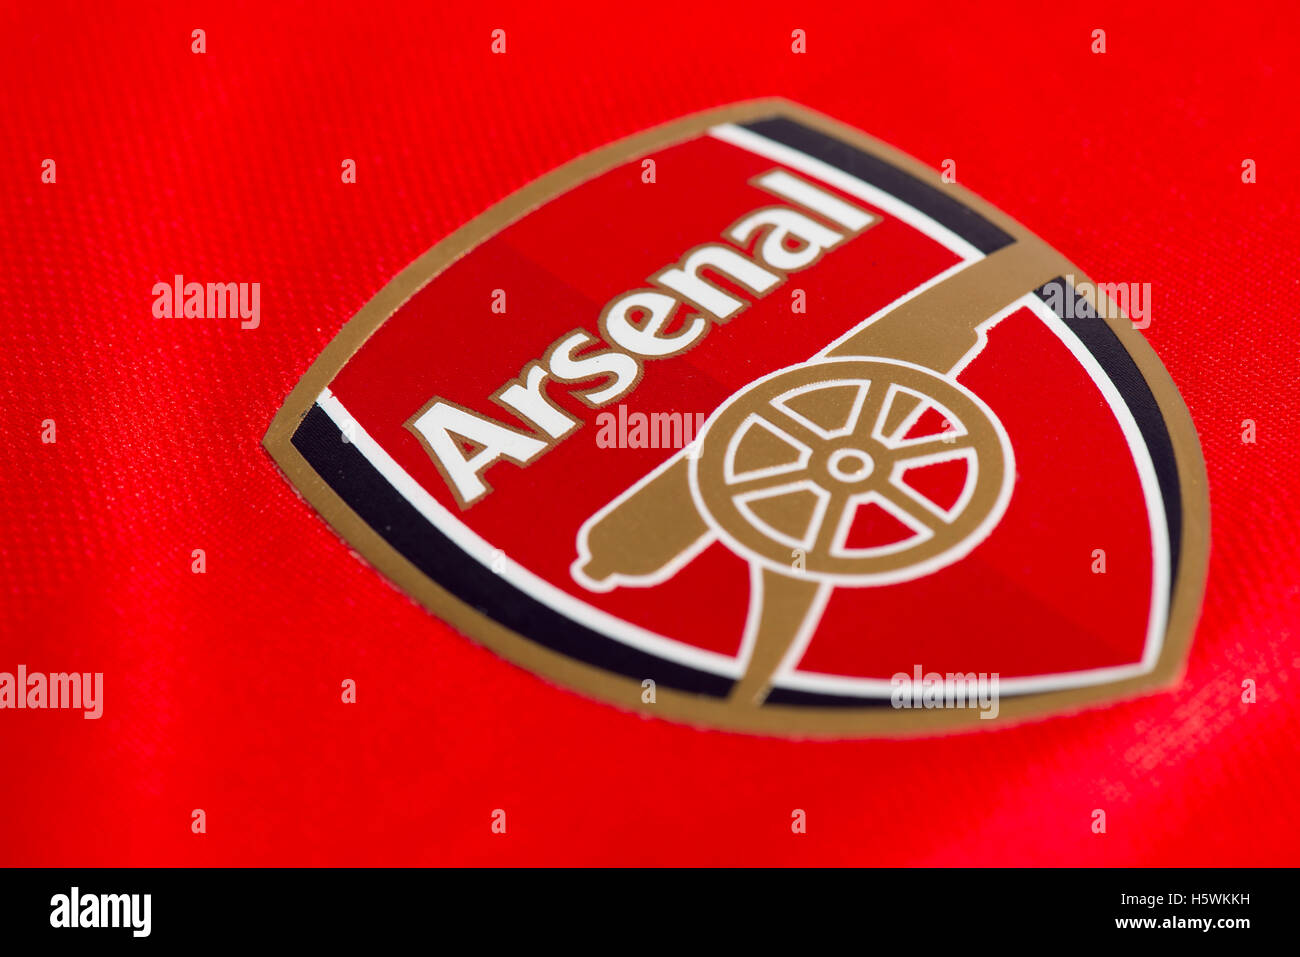 Premier League Arsenal football club badge Stock Photo